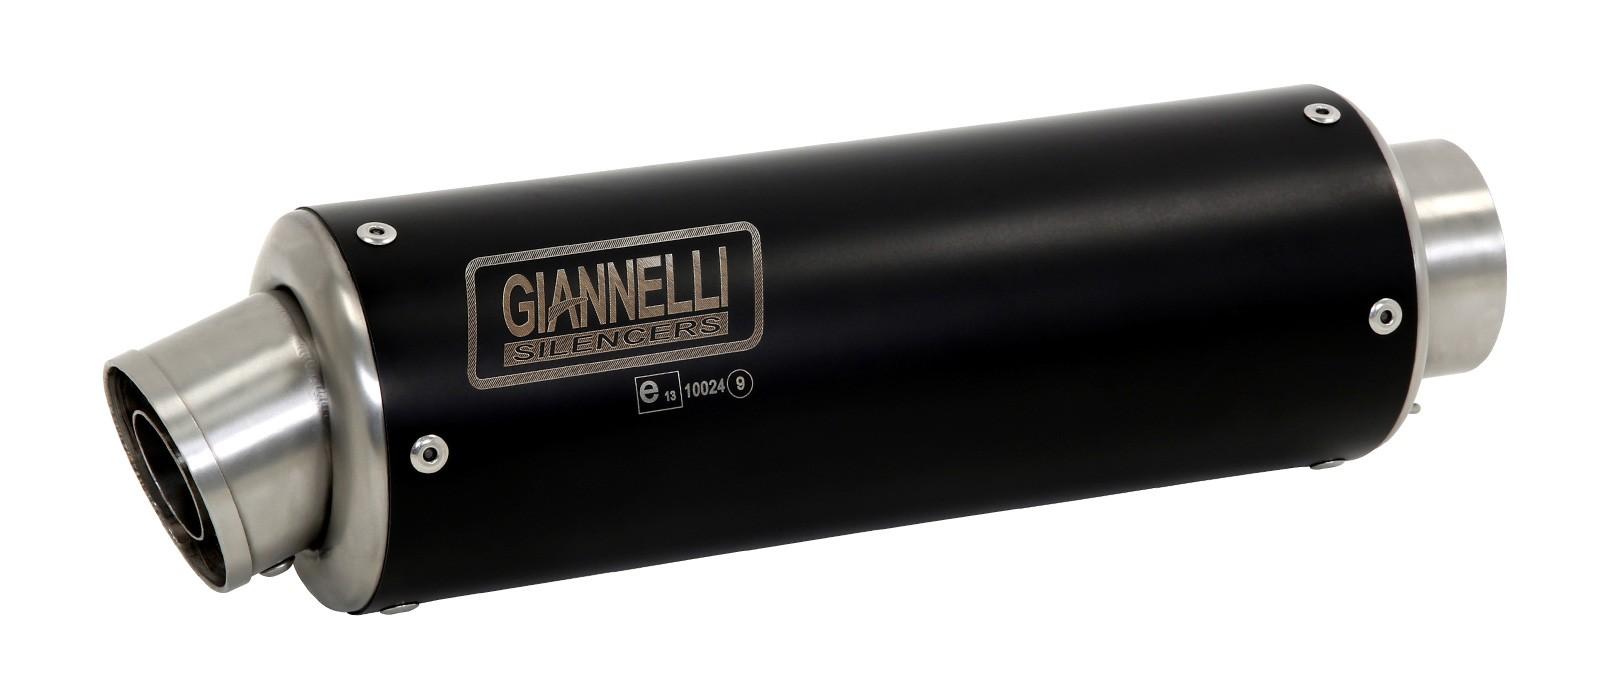 ESCAPES GIANNELLI YAMAHA - Sistema completo nicrom X-PRO Yamaha YZF-R 125 Giannelli 73549XPI -